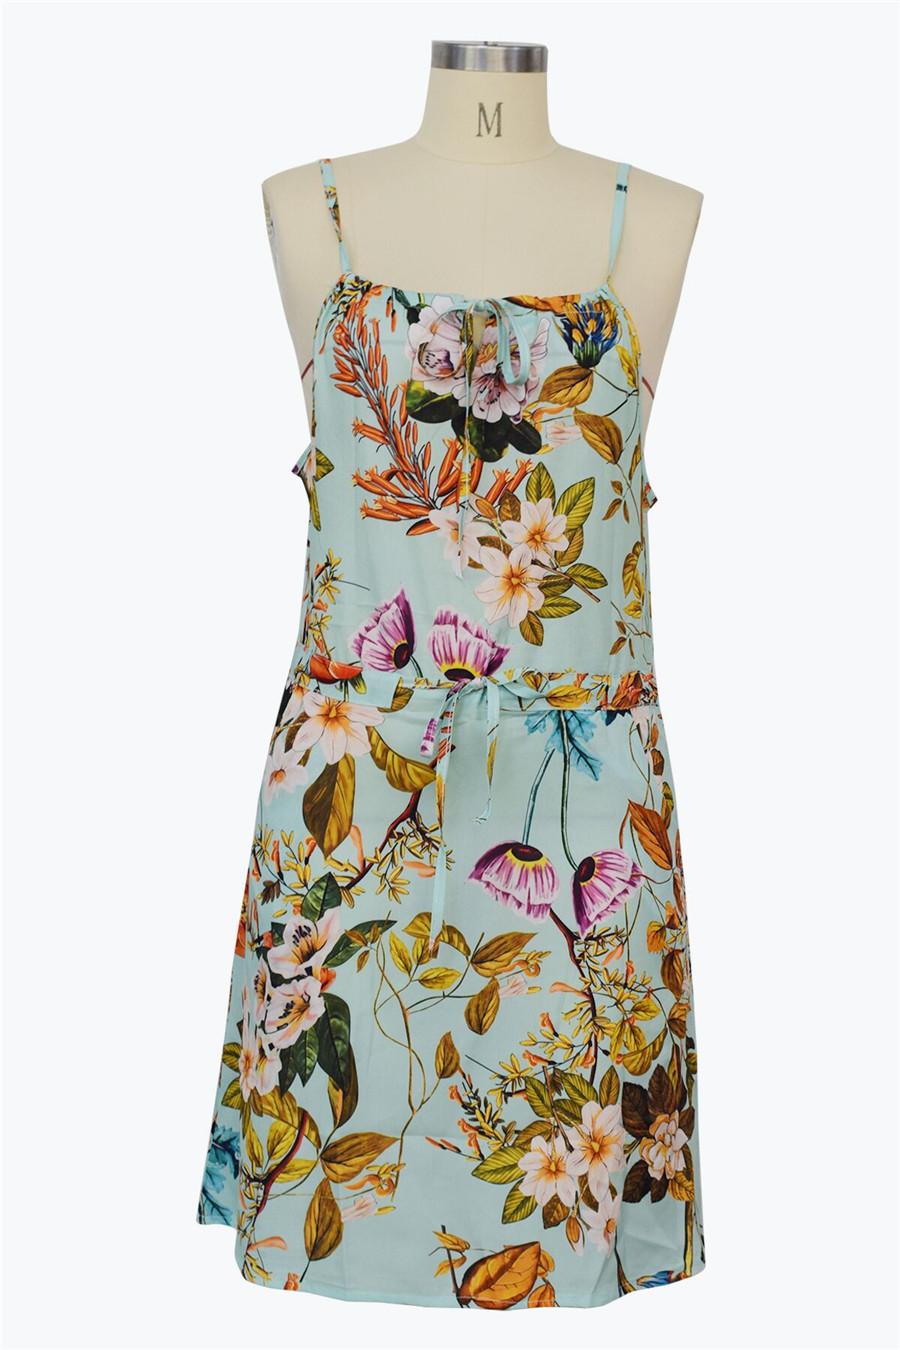 Gladiolus Chiffon Women Summer Dress Spaghetti Strap Floral Print Pocket Sexy Bohemian Beach Dress 2019 Short Ladies Dresses (29)